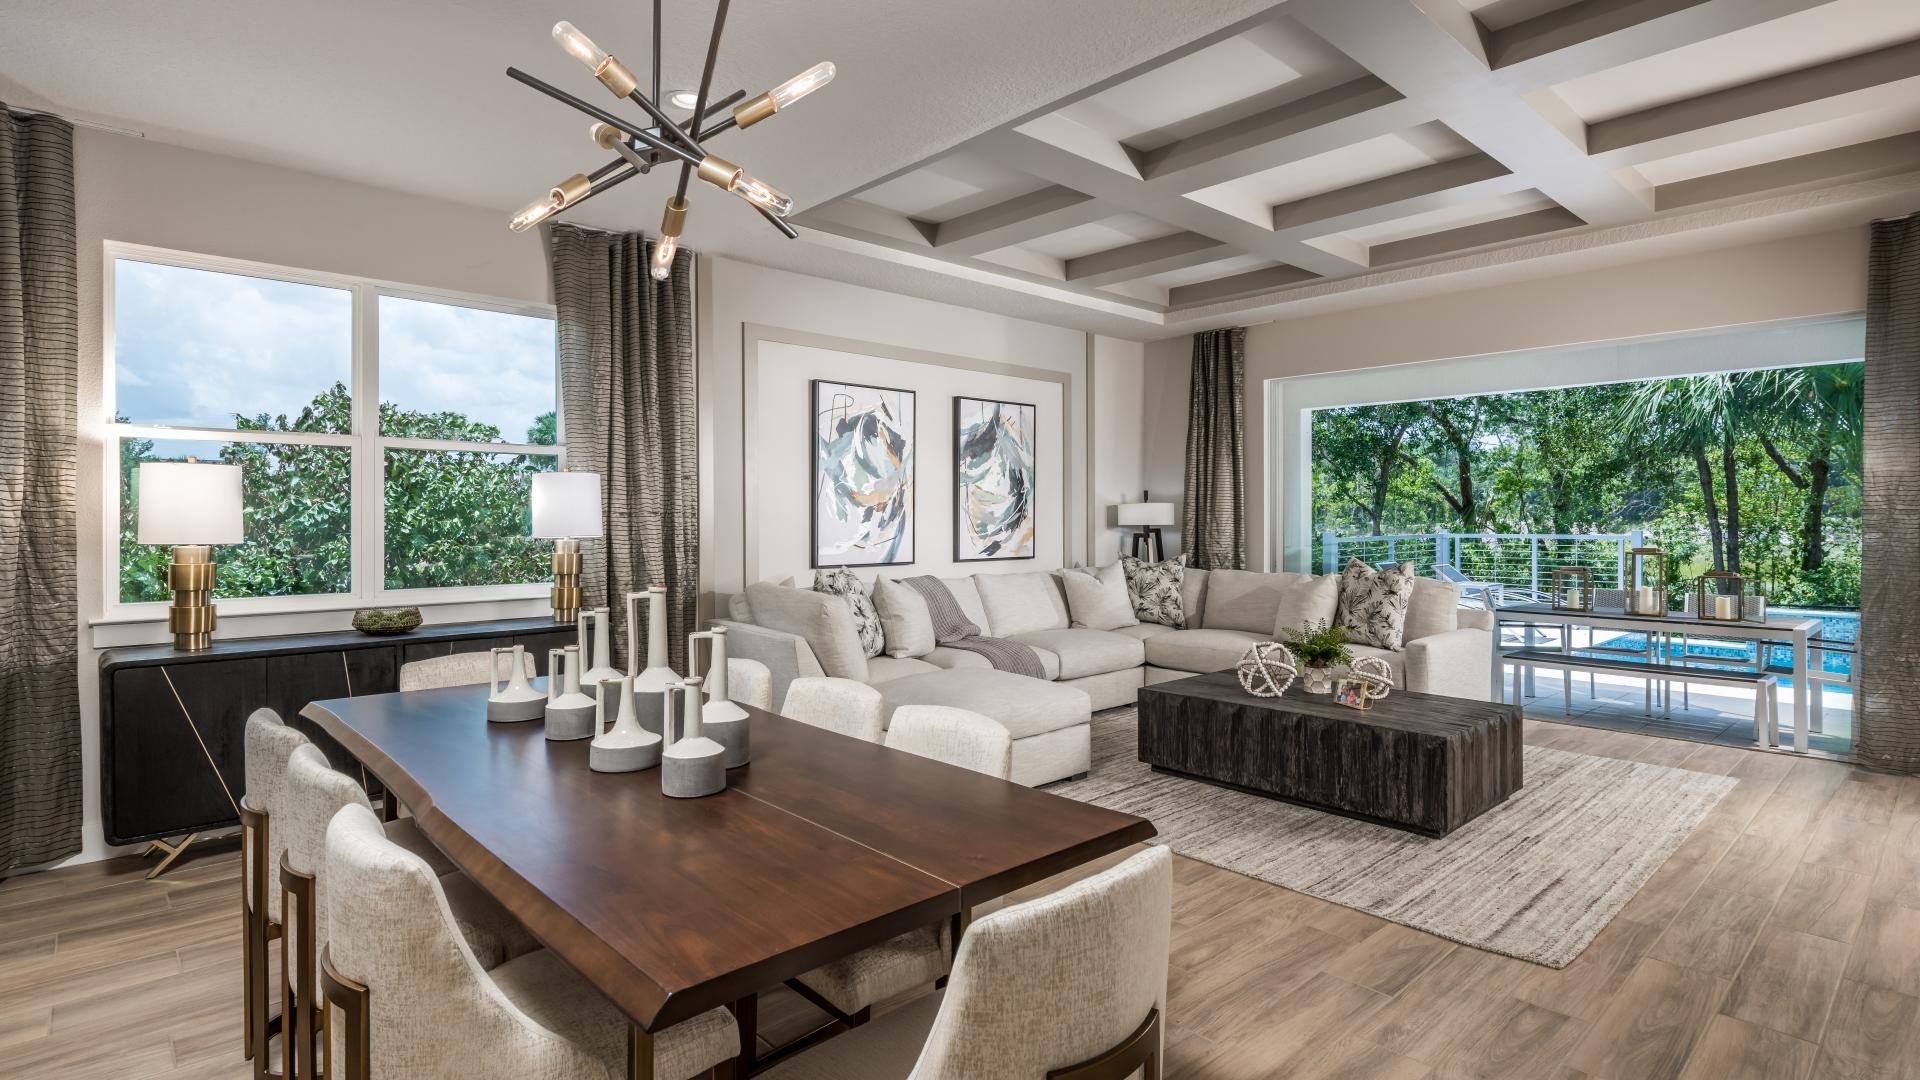 Open floor plans with abundant natural light